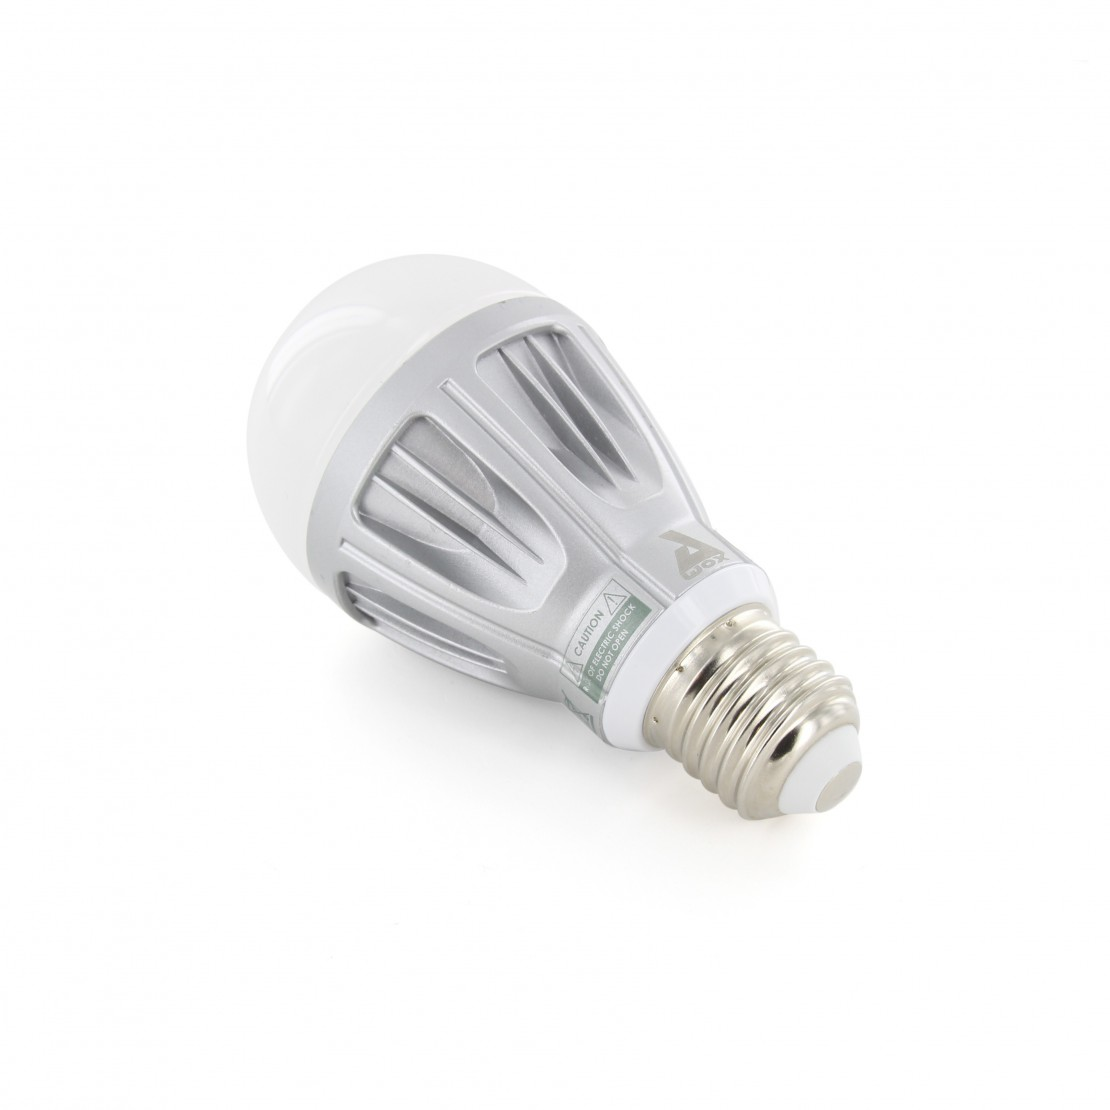 SmartLIGHT - smartlamp, E27, wit, Bluetooth